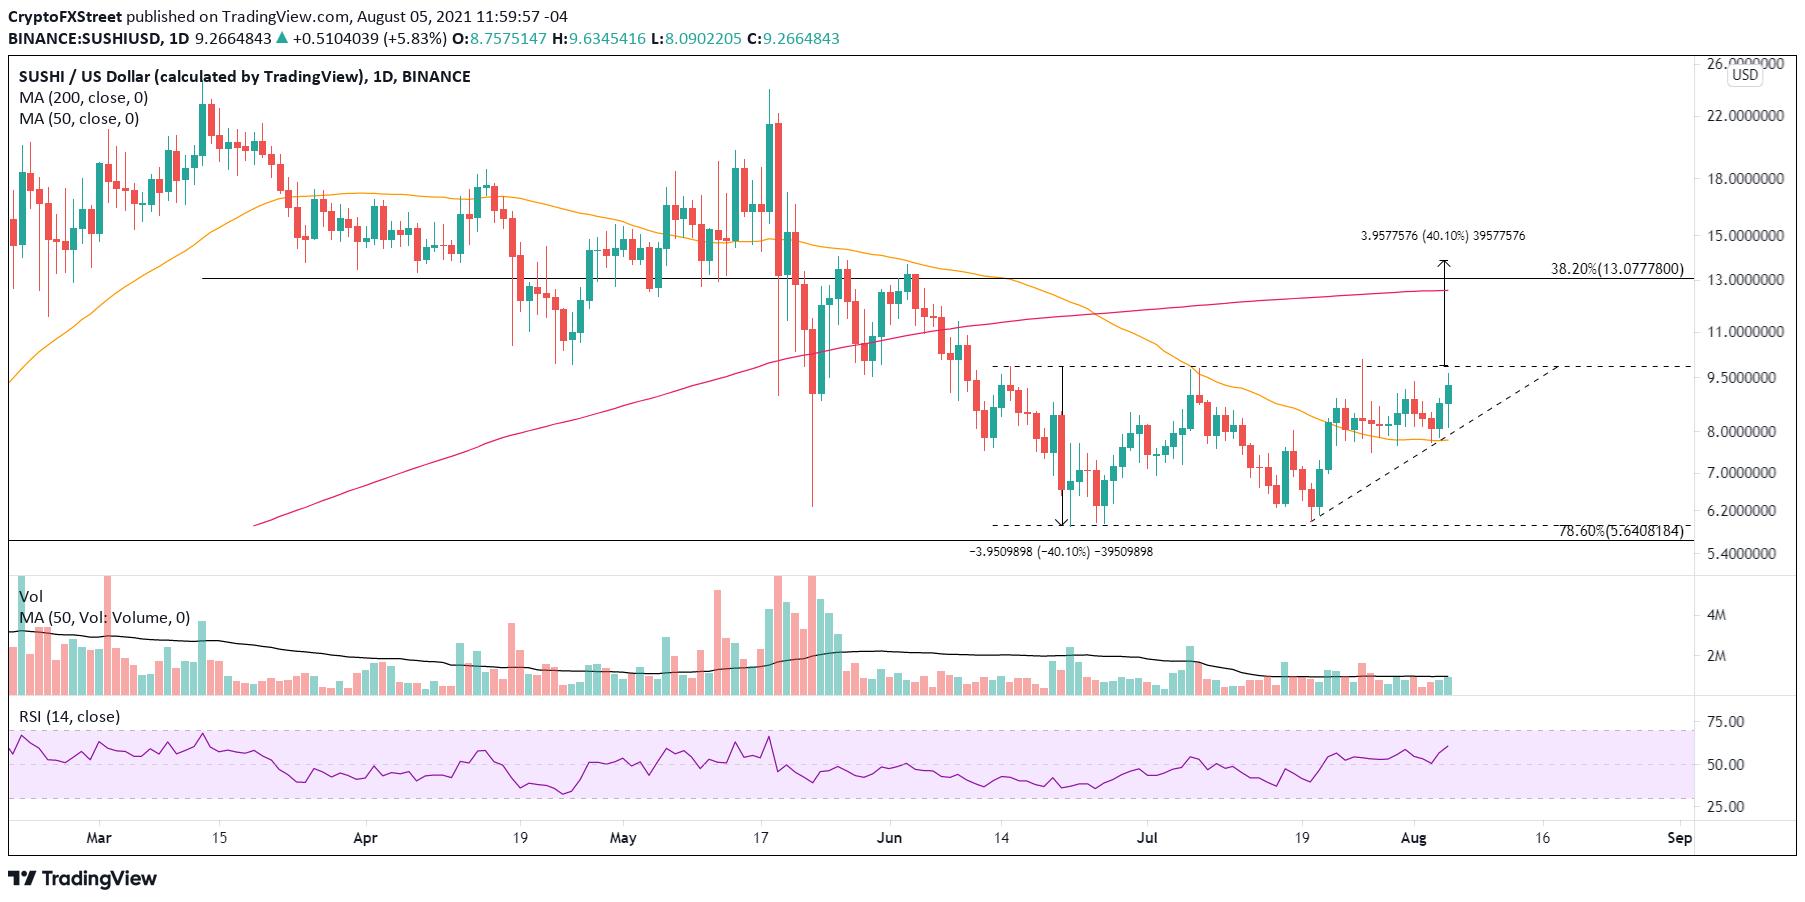 SUSHI/USD daily chart